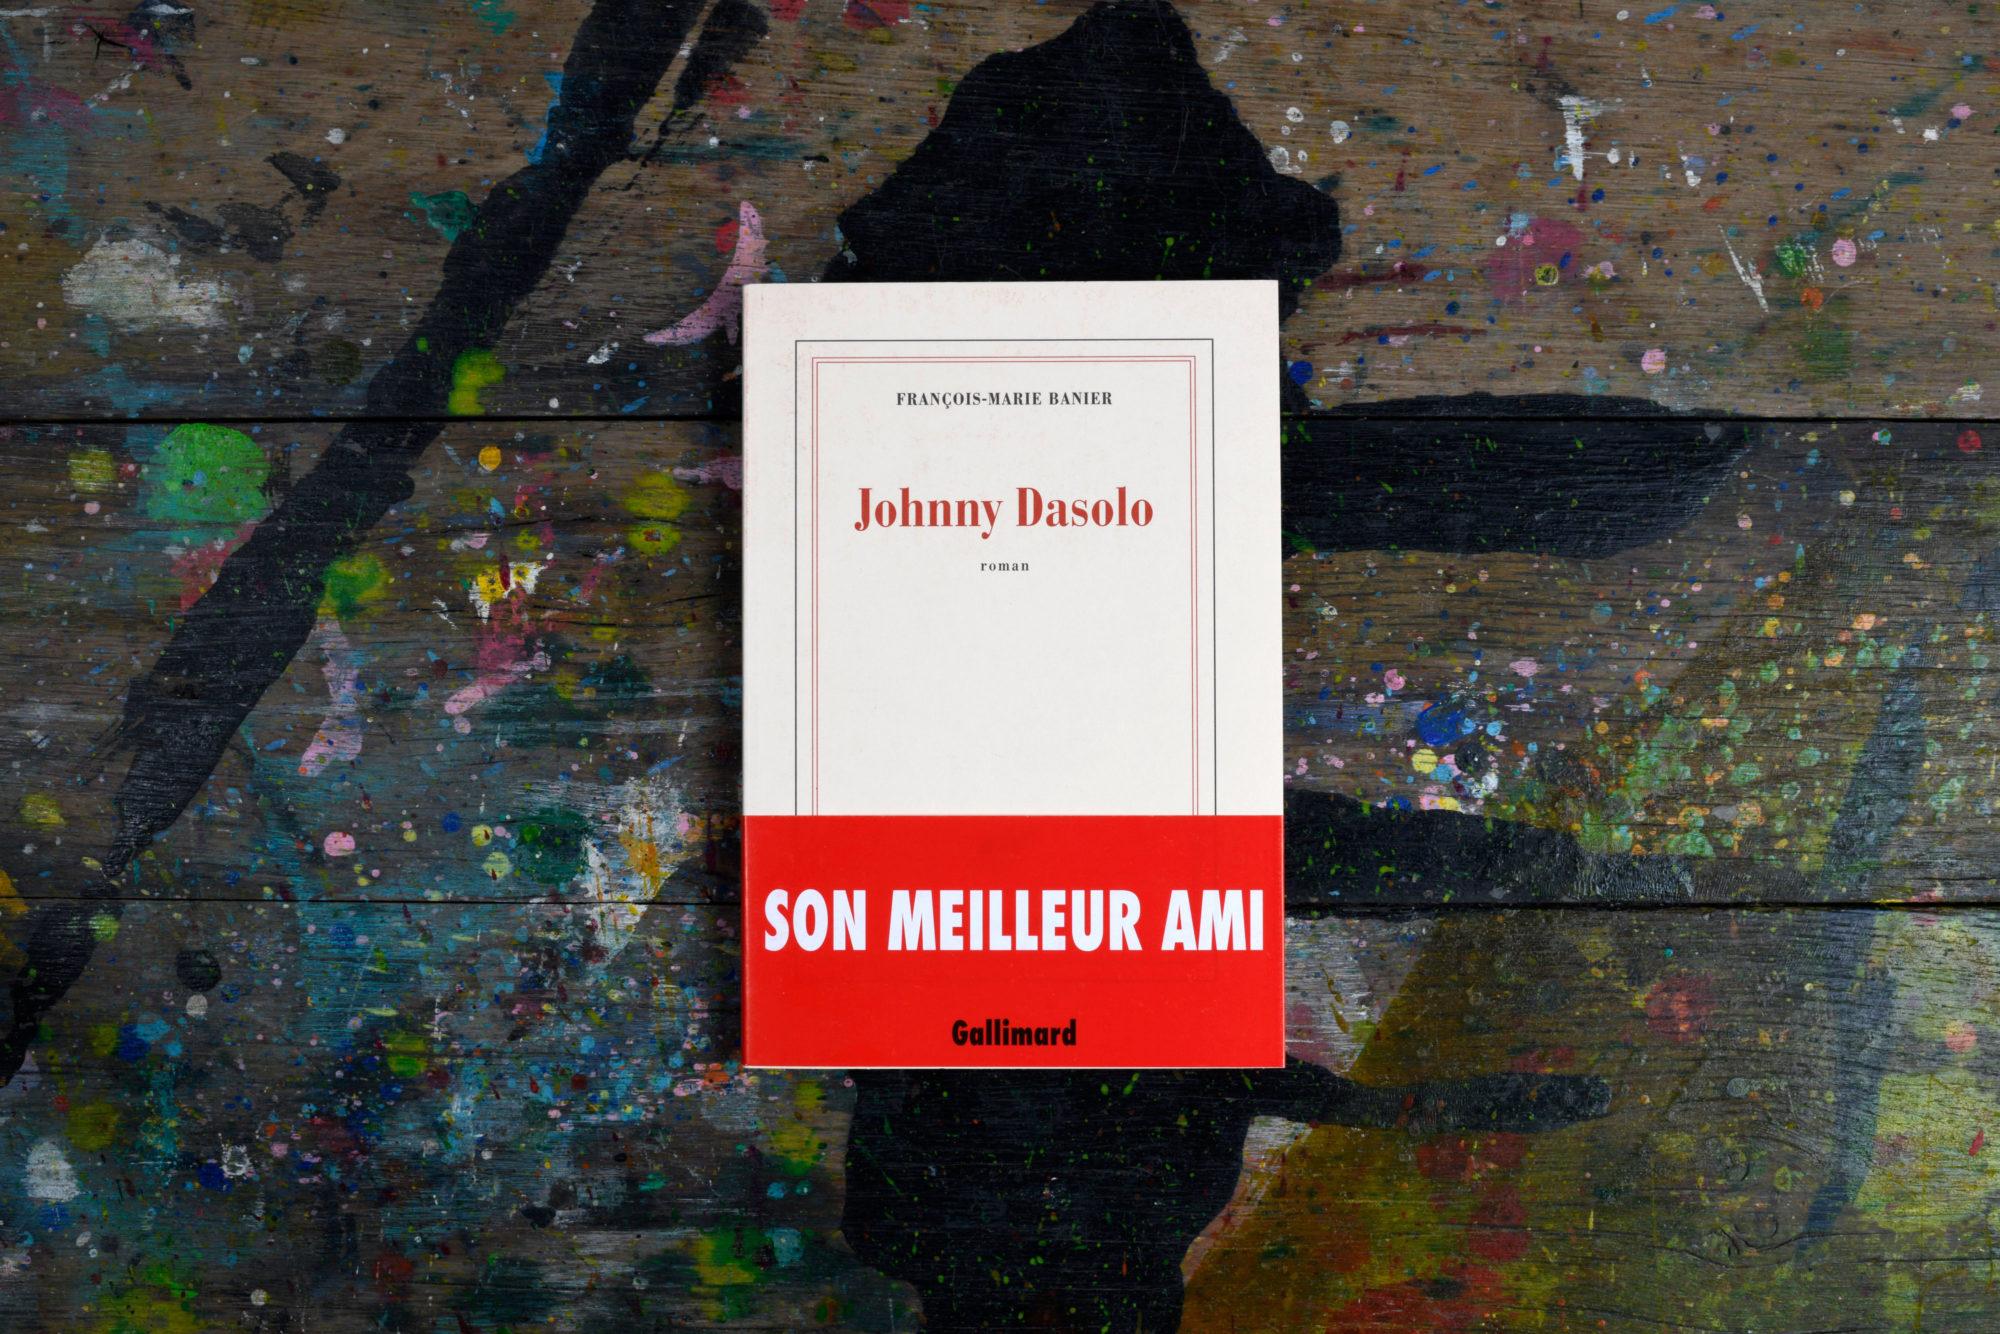 Johnny Dasolo - François-Marie Banier